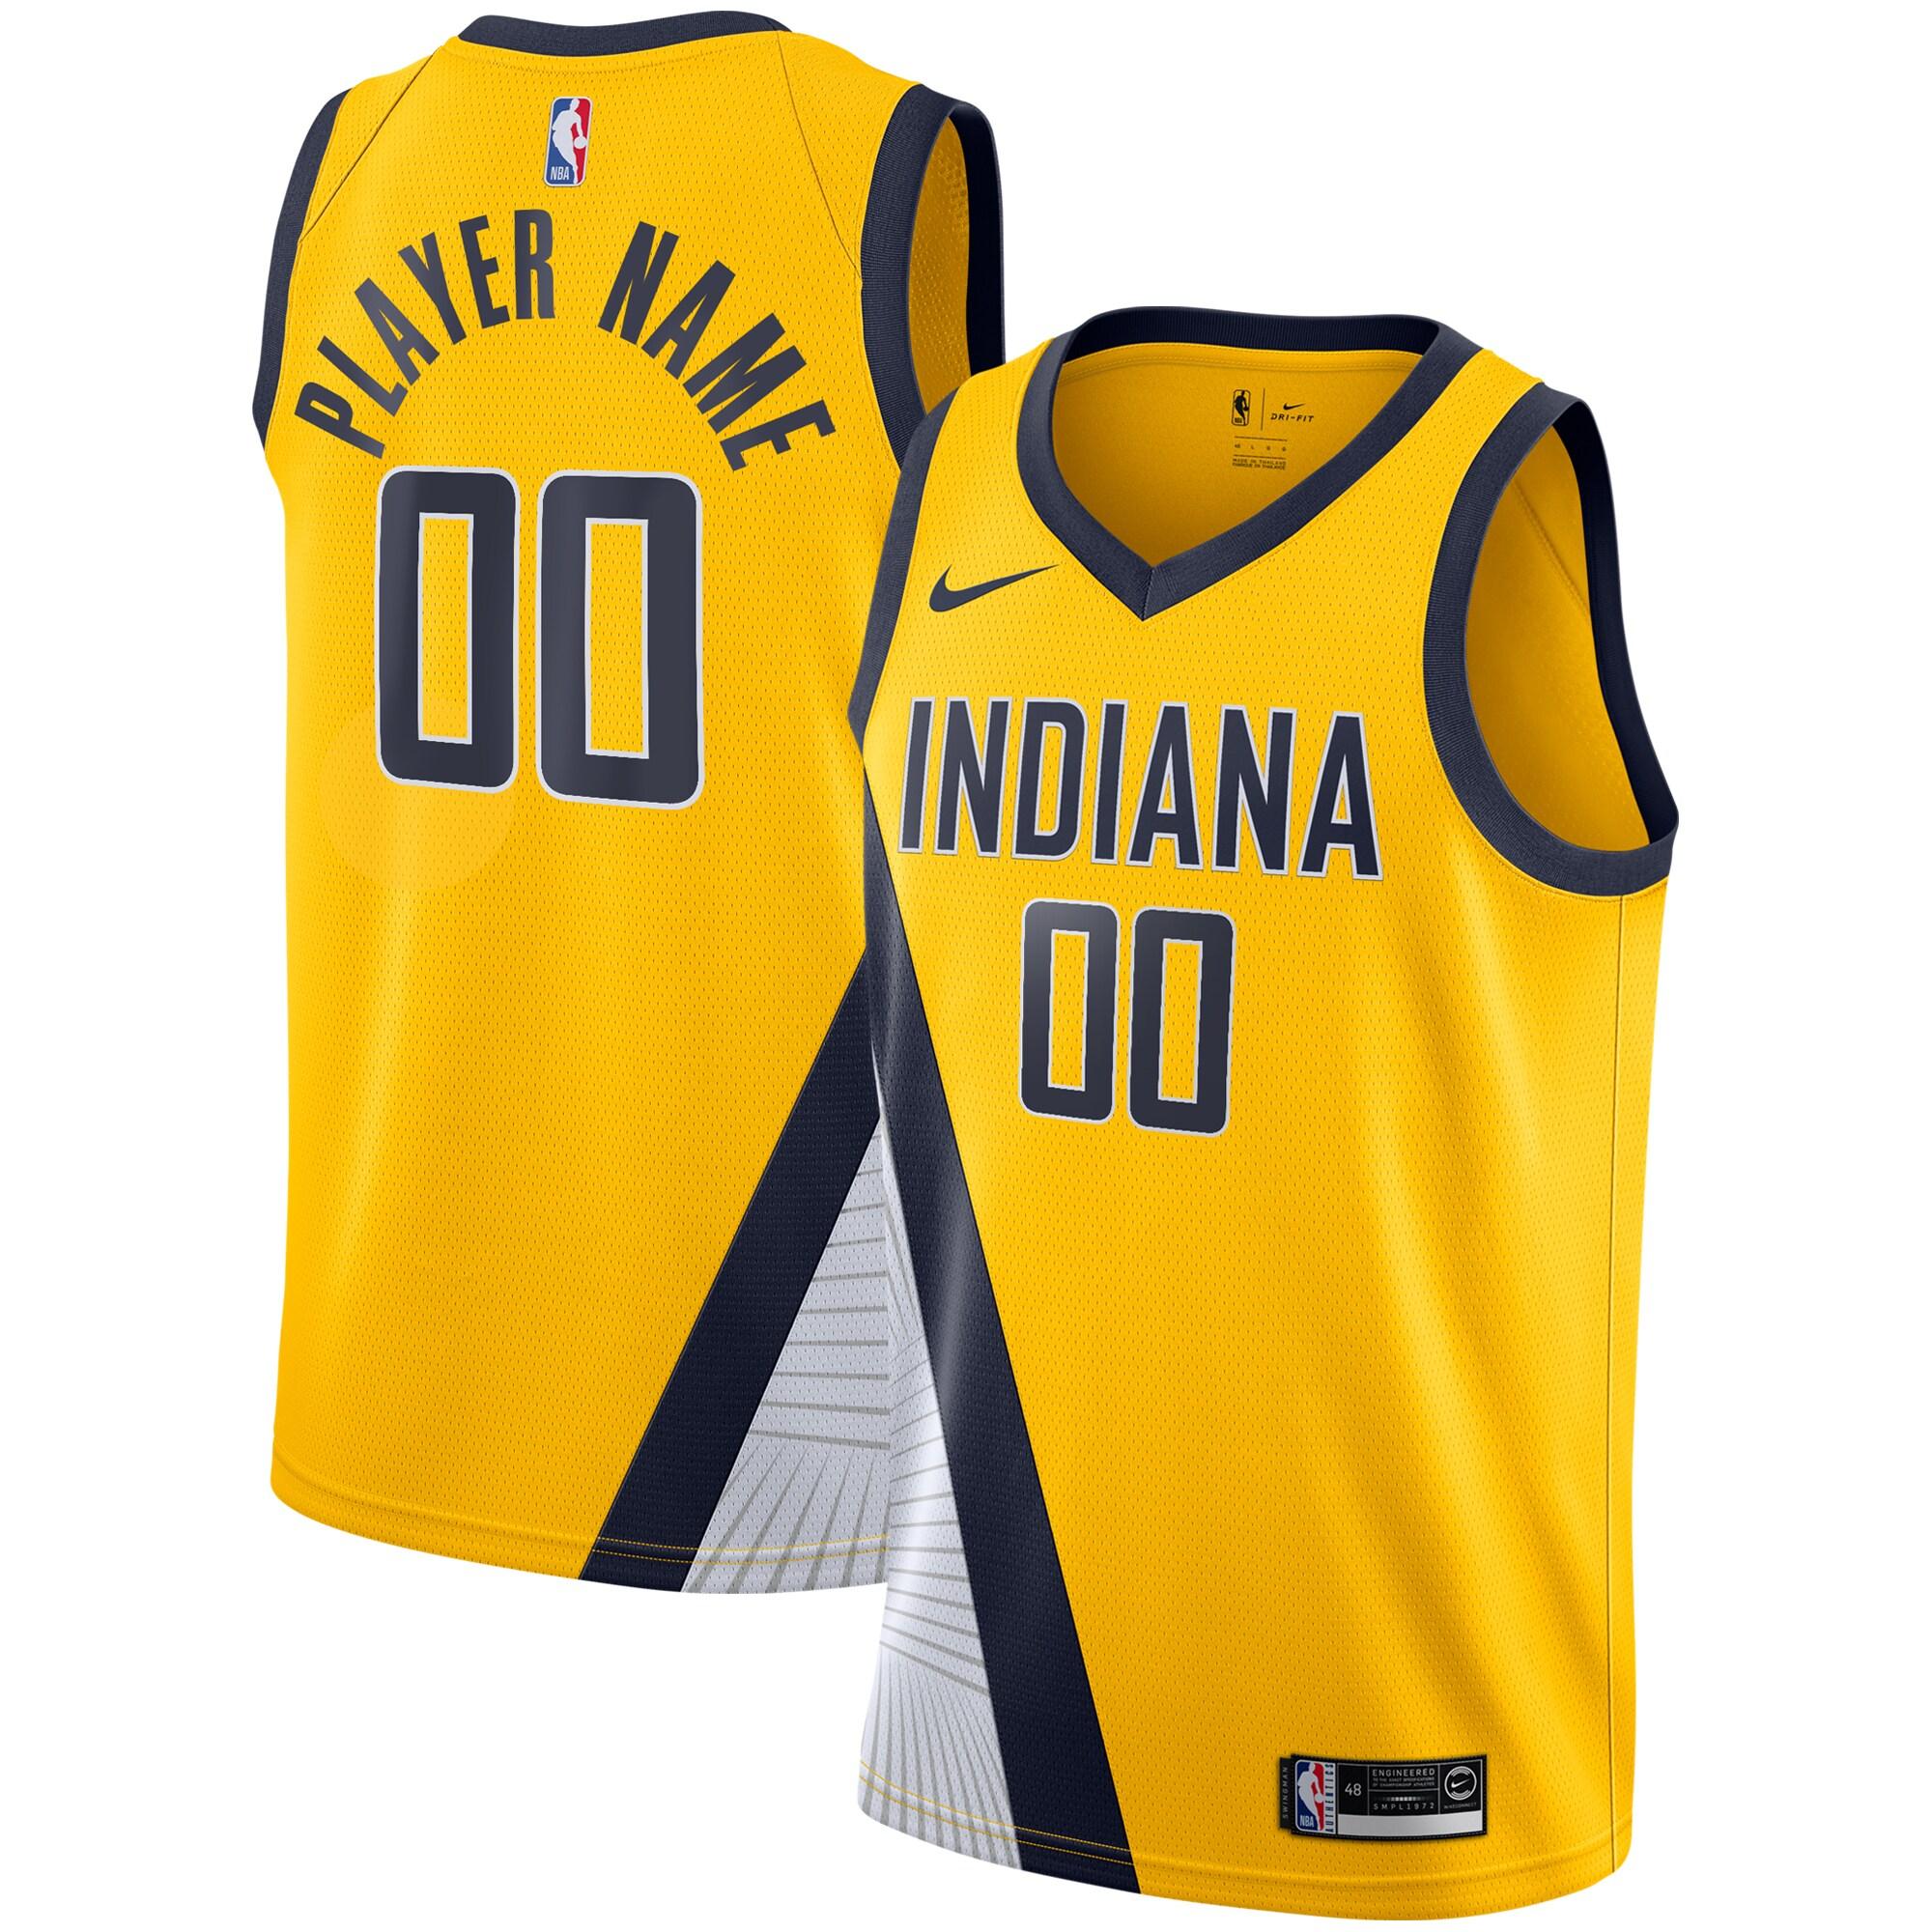 Indiana Pacers Nike 2019/20 Custom Swingman Jersey Yellow - Statement Edition